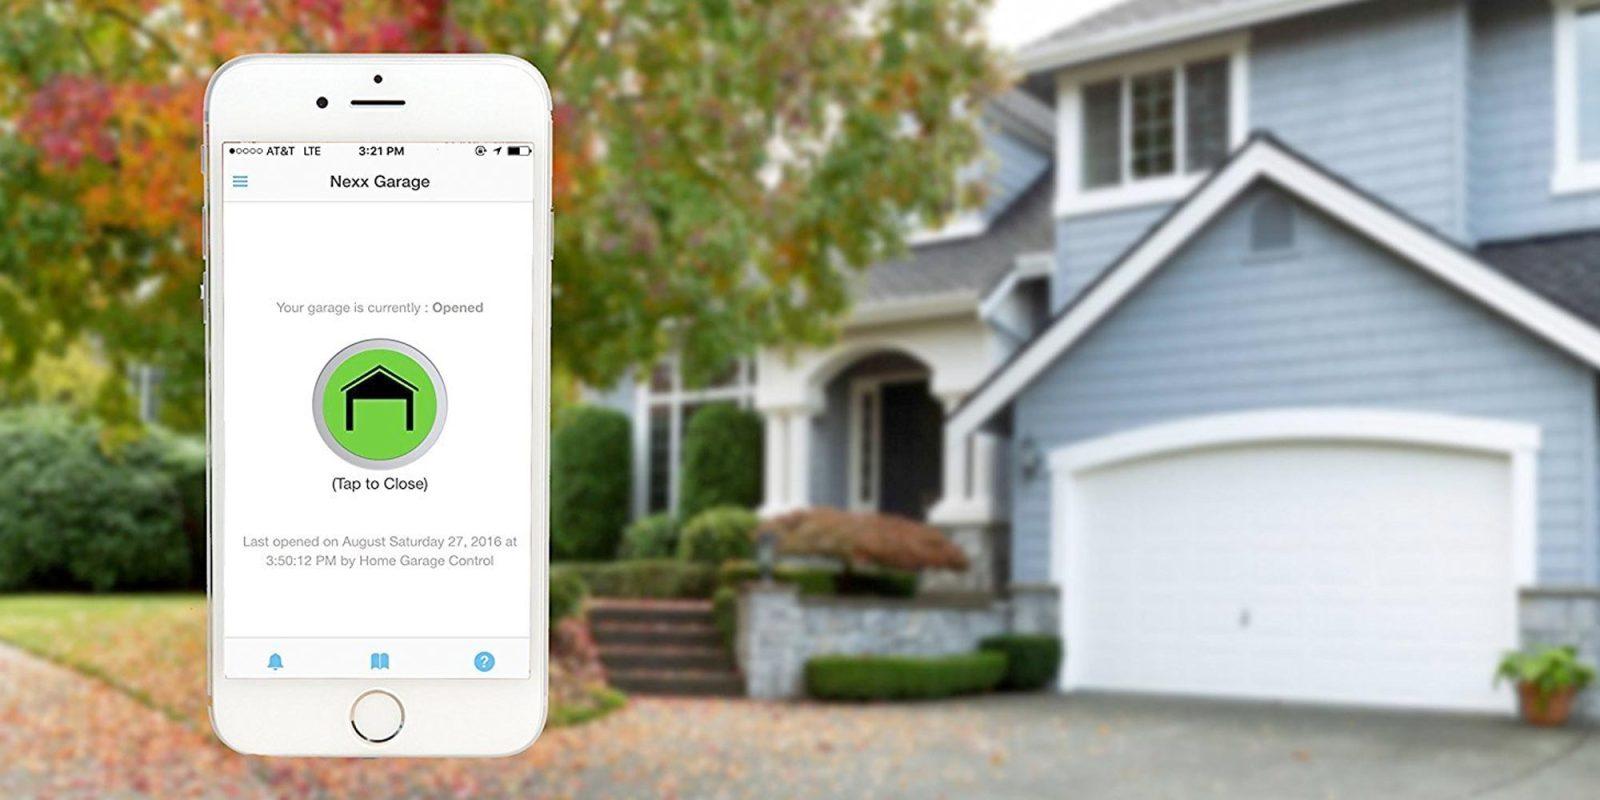 This $70 device will make your garage door opener smart (Save 25%)